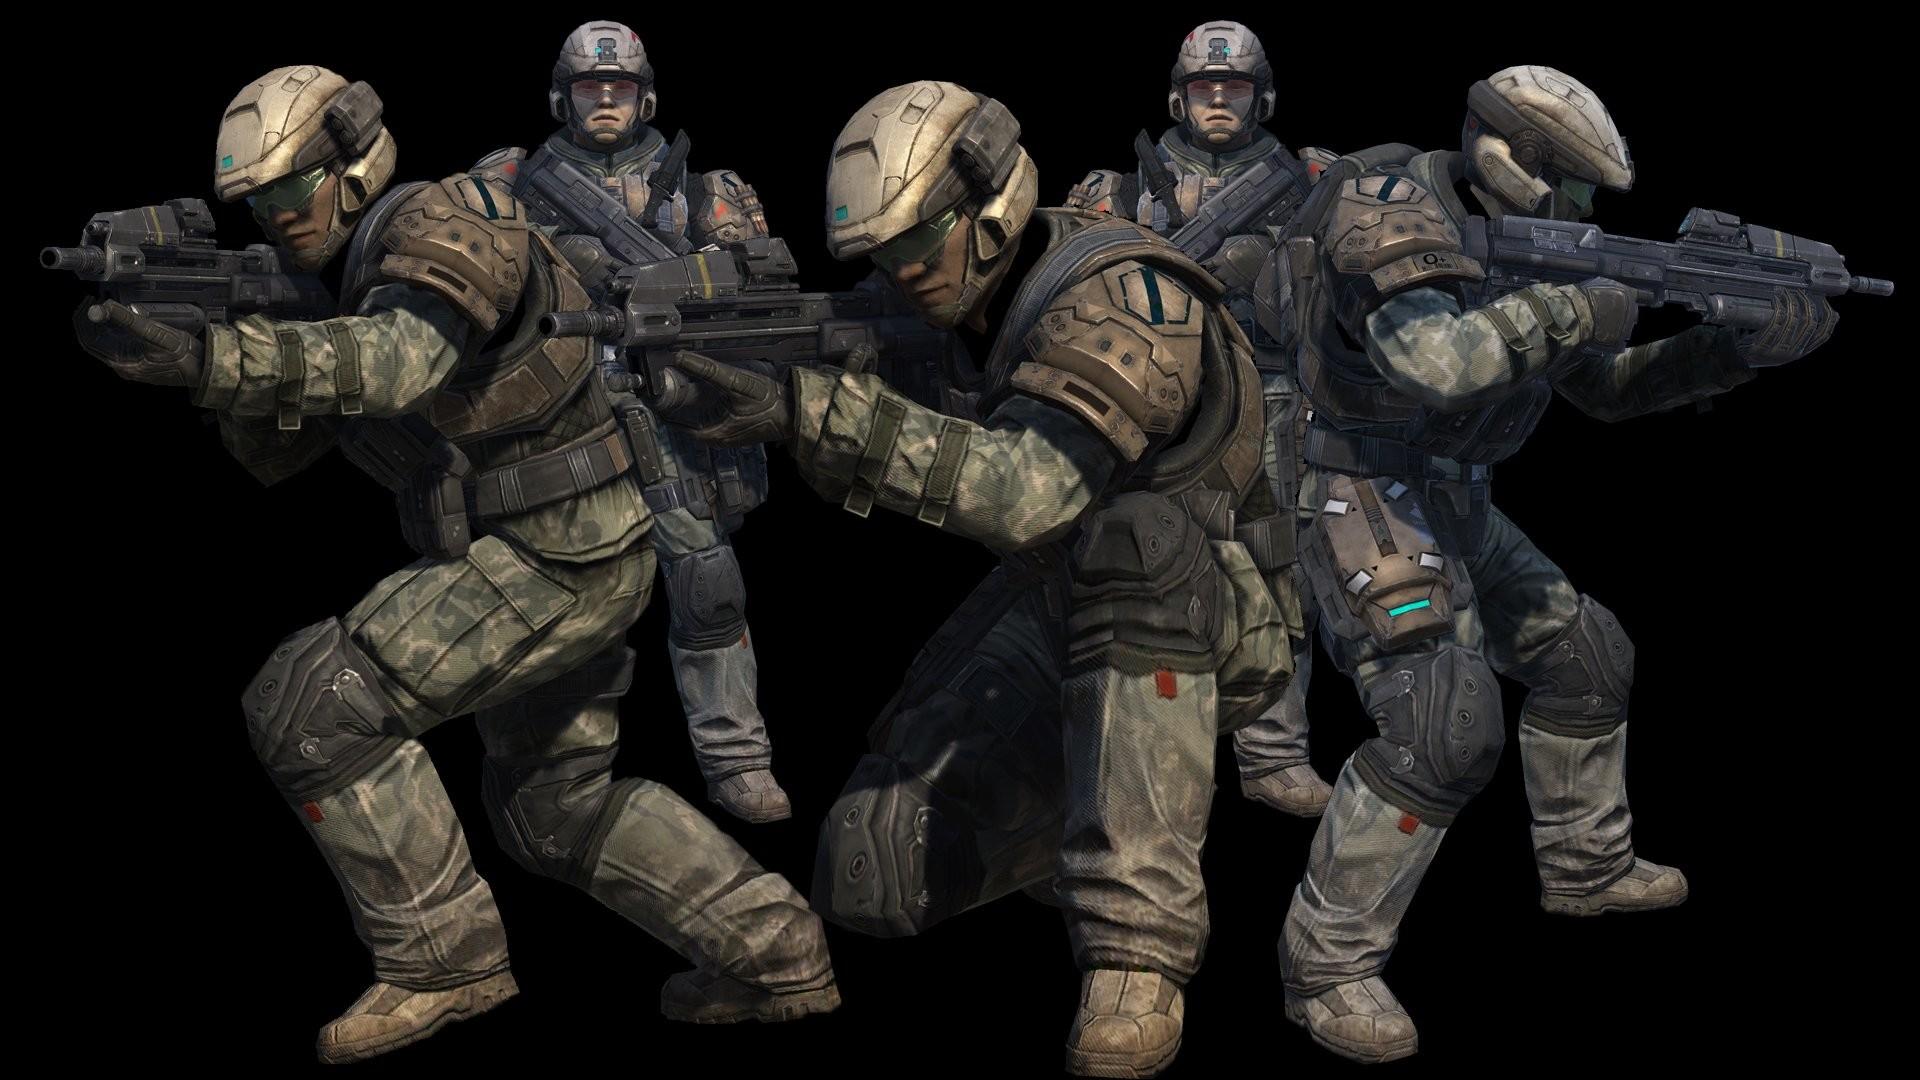 Halo Reach Marines